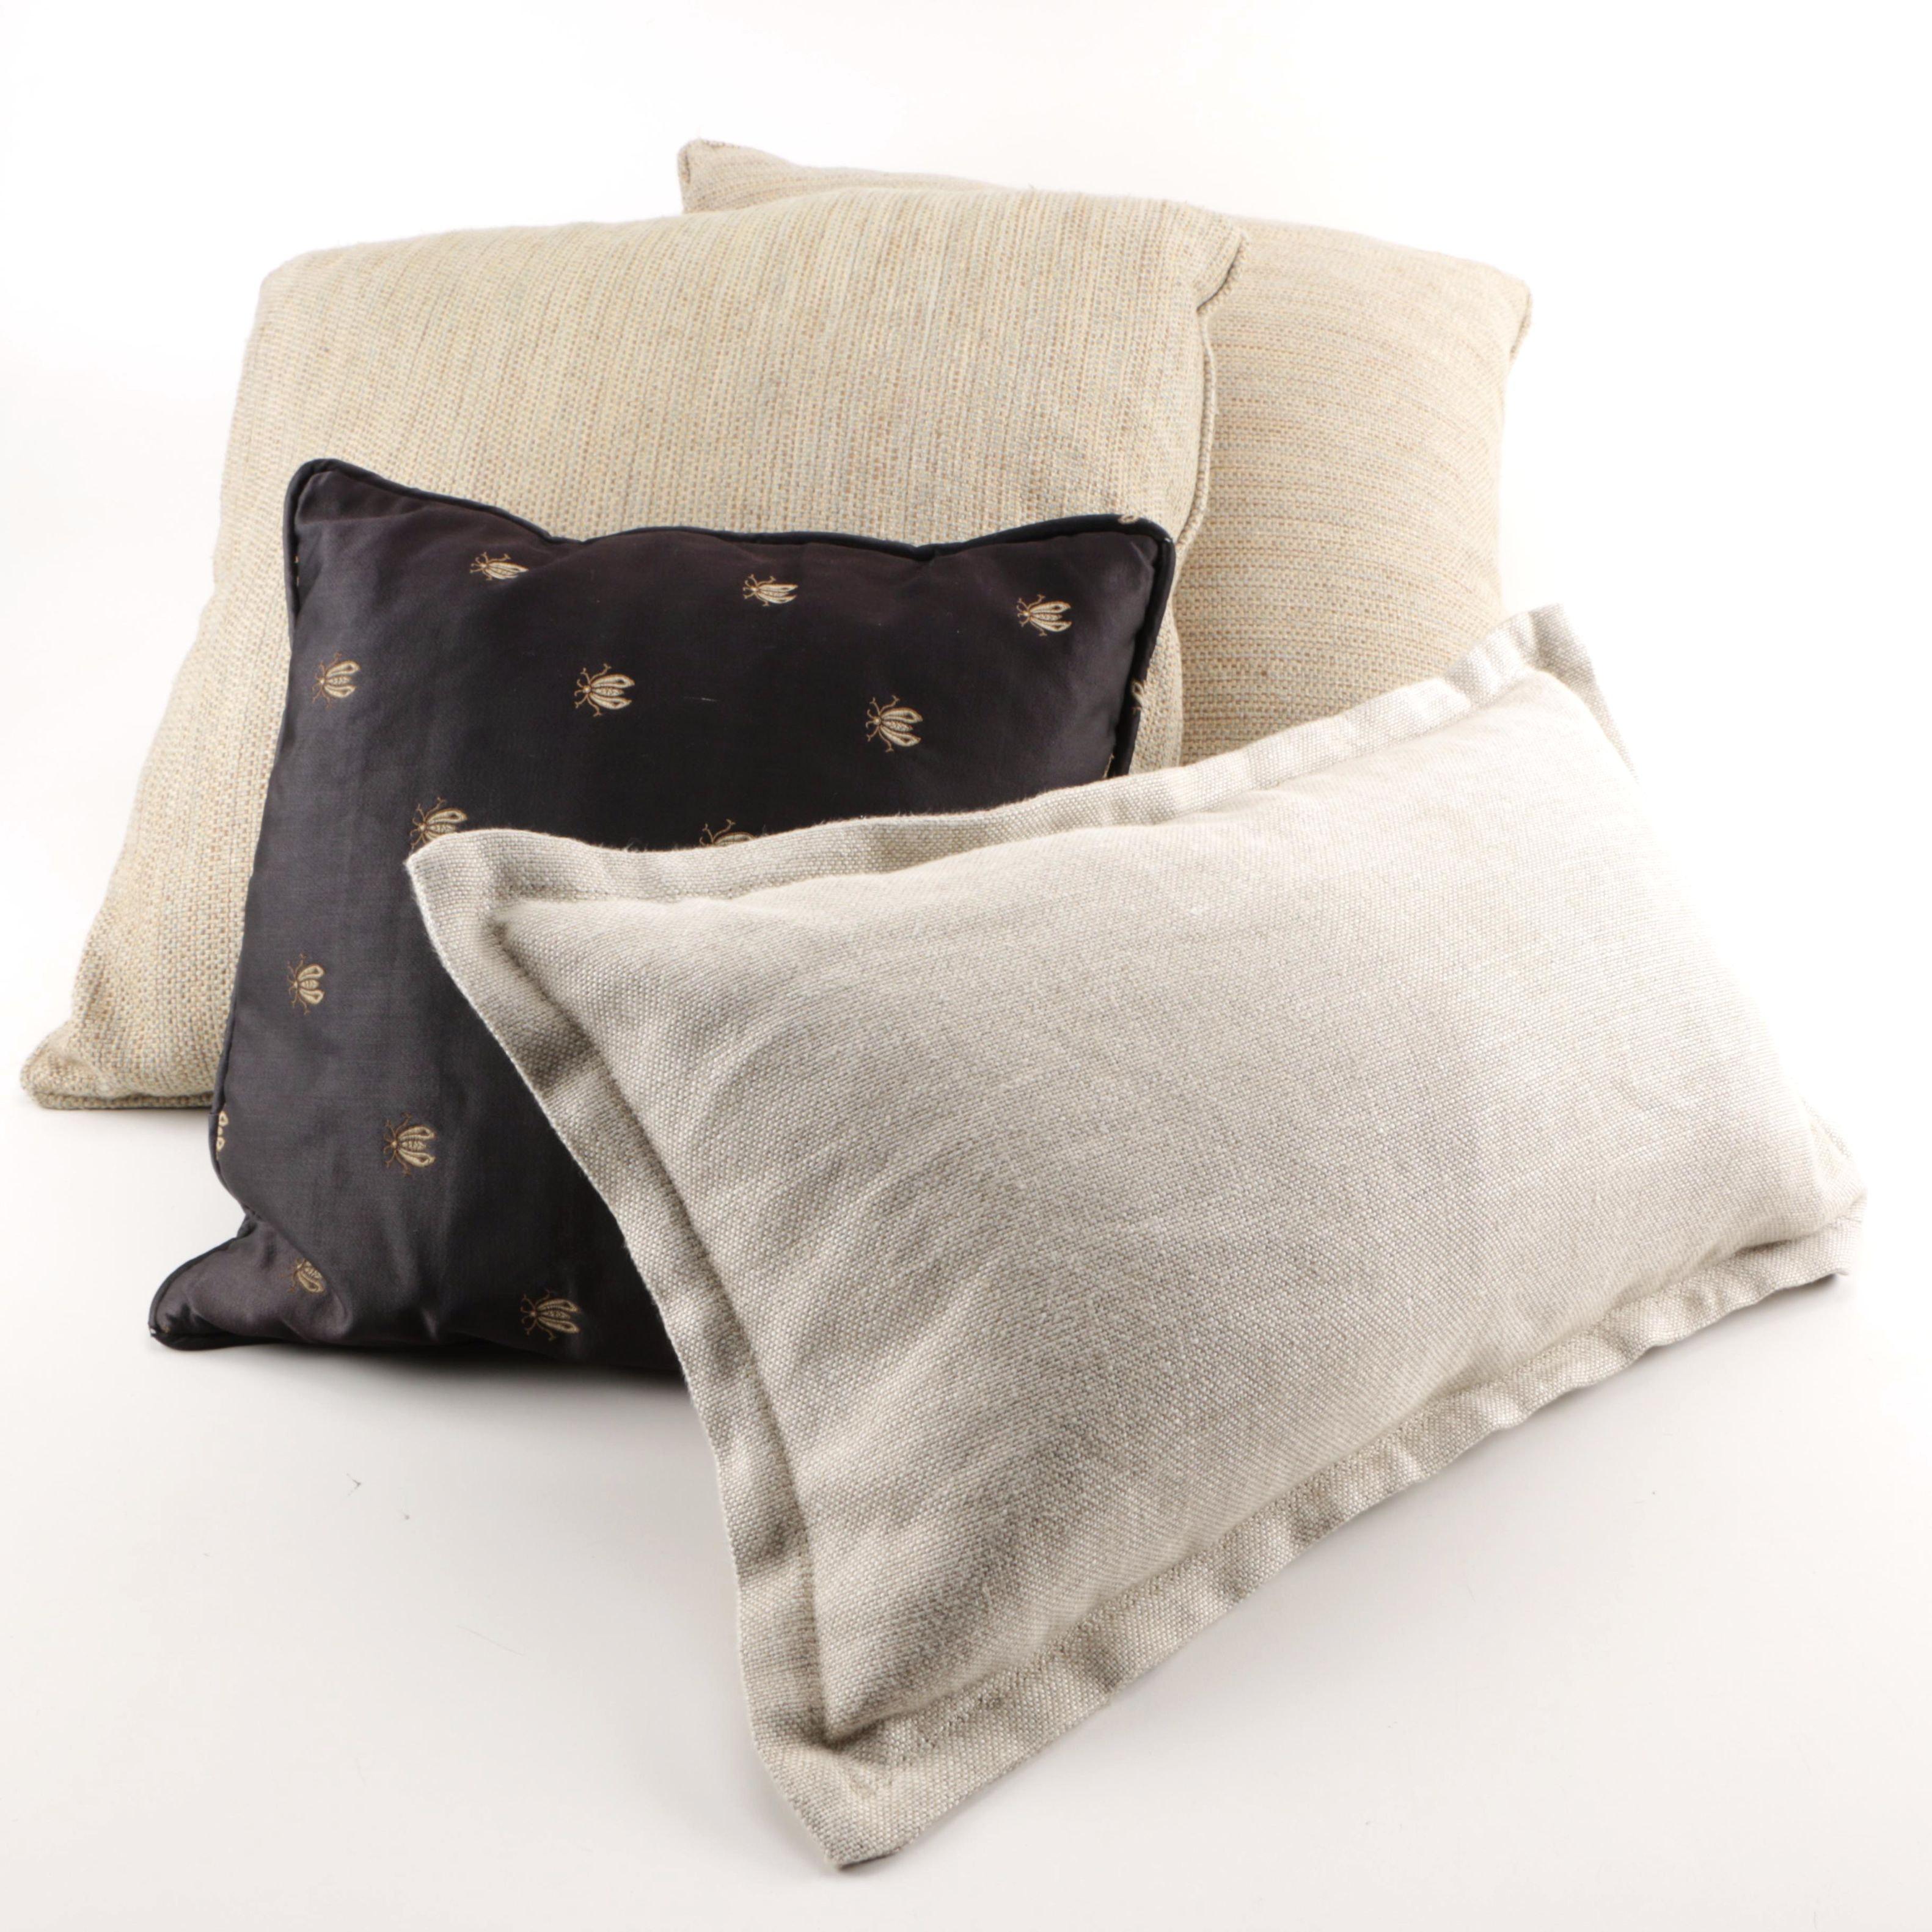 Decorative Accent Pillows featuring Restoration Hardware